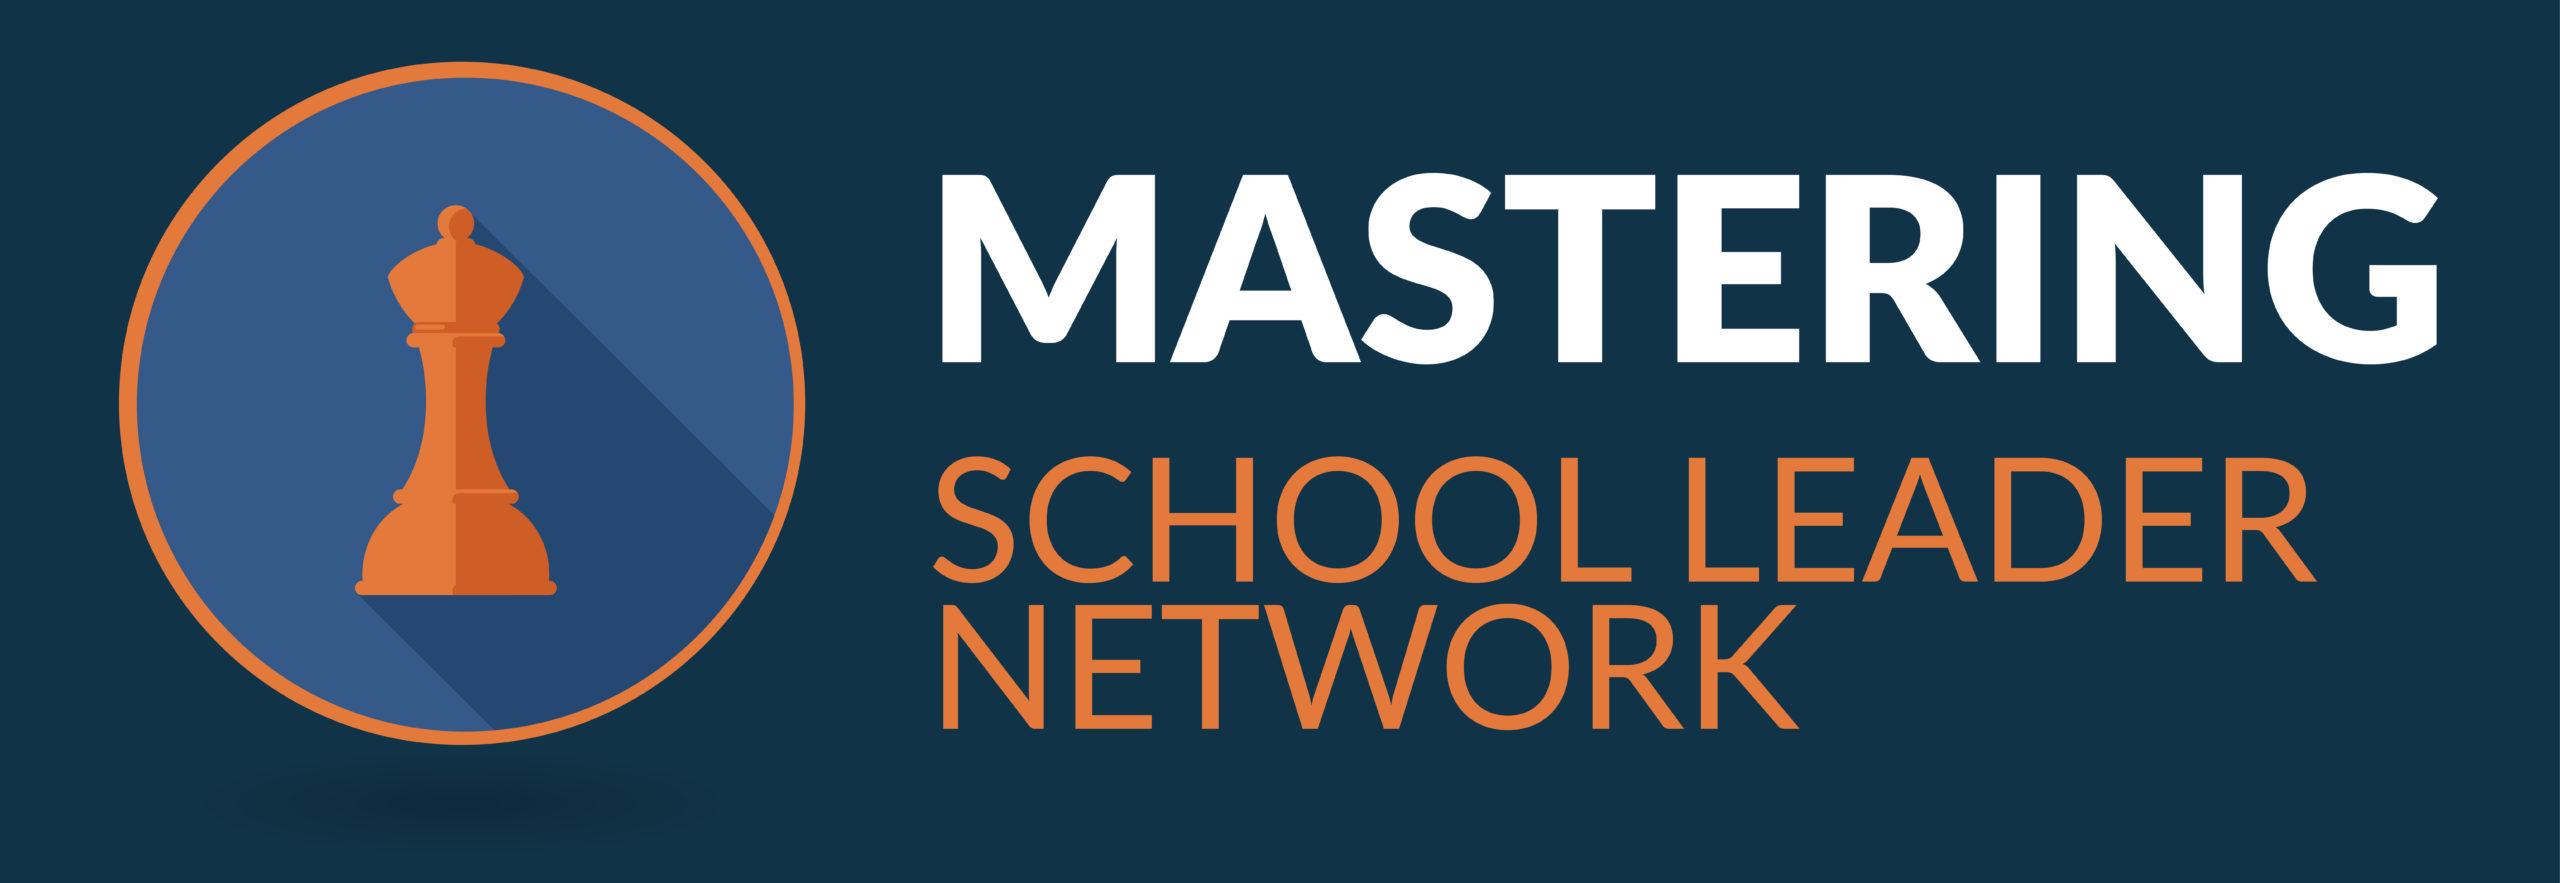 Mastering School Leader Network